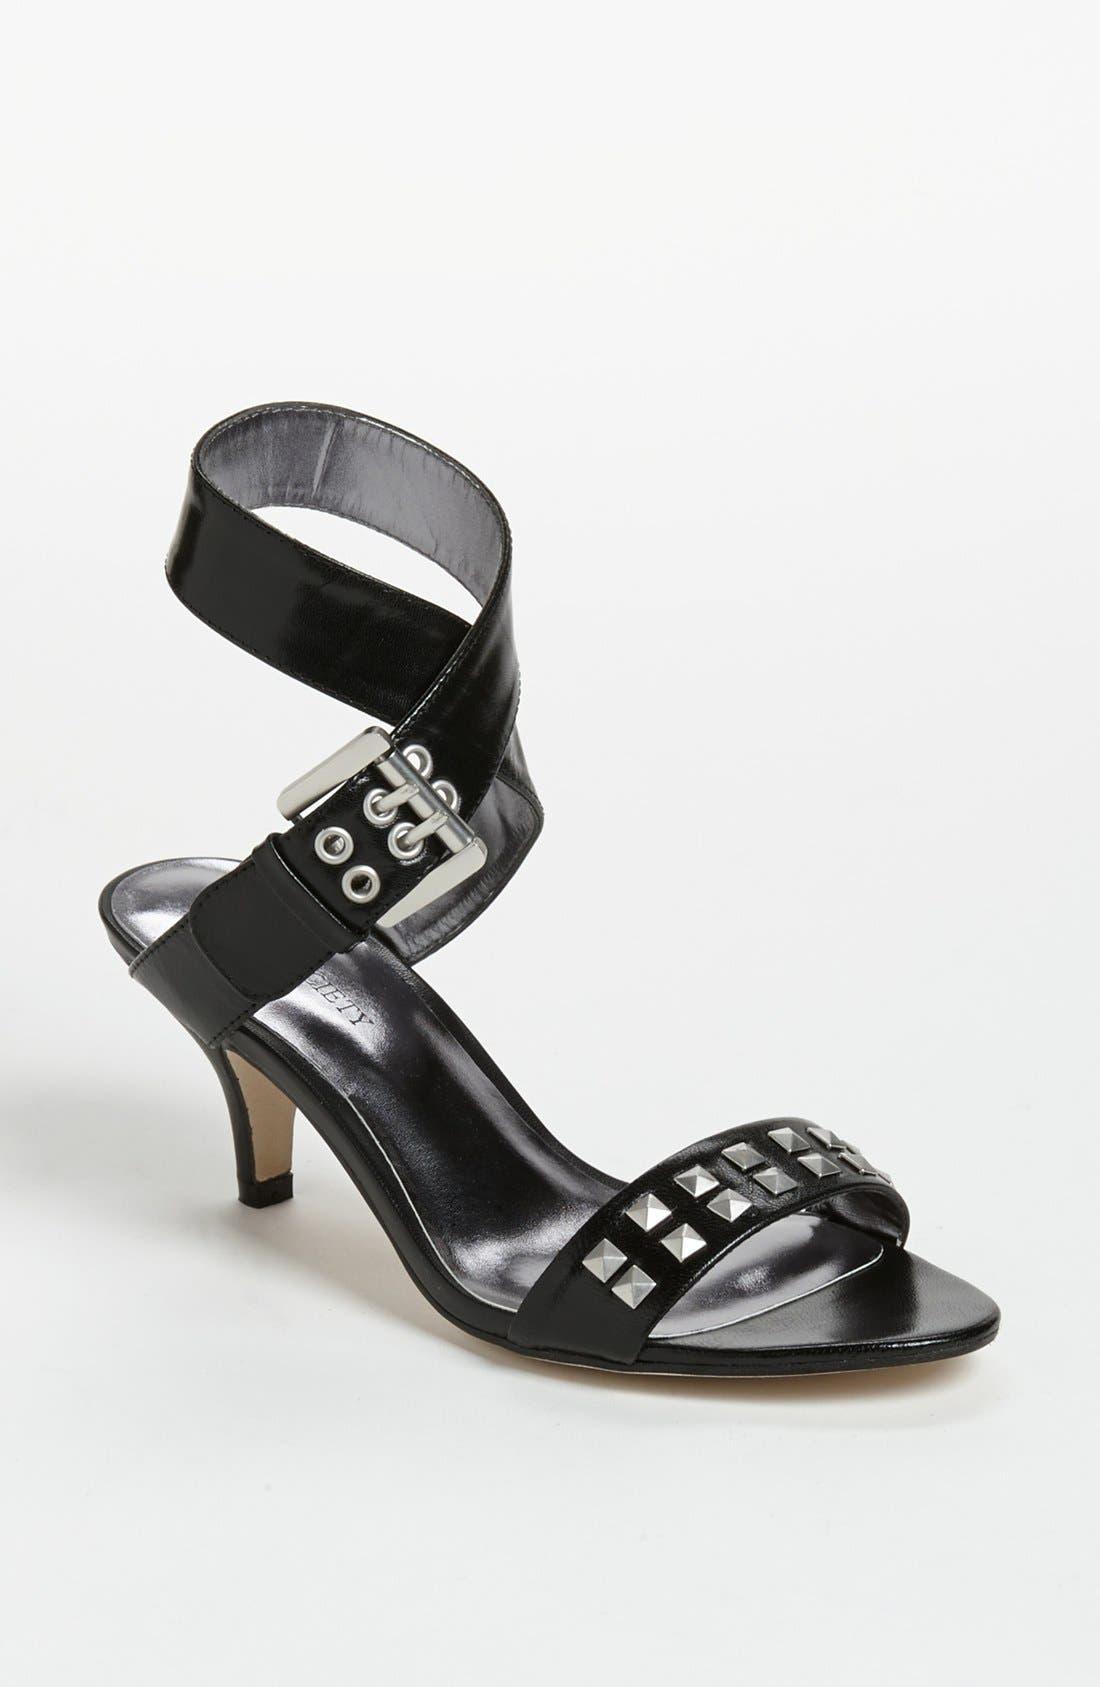 Main Image - Sole Society 'Jade' Sandal